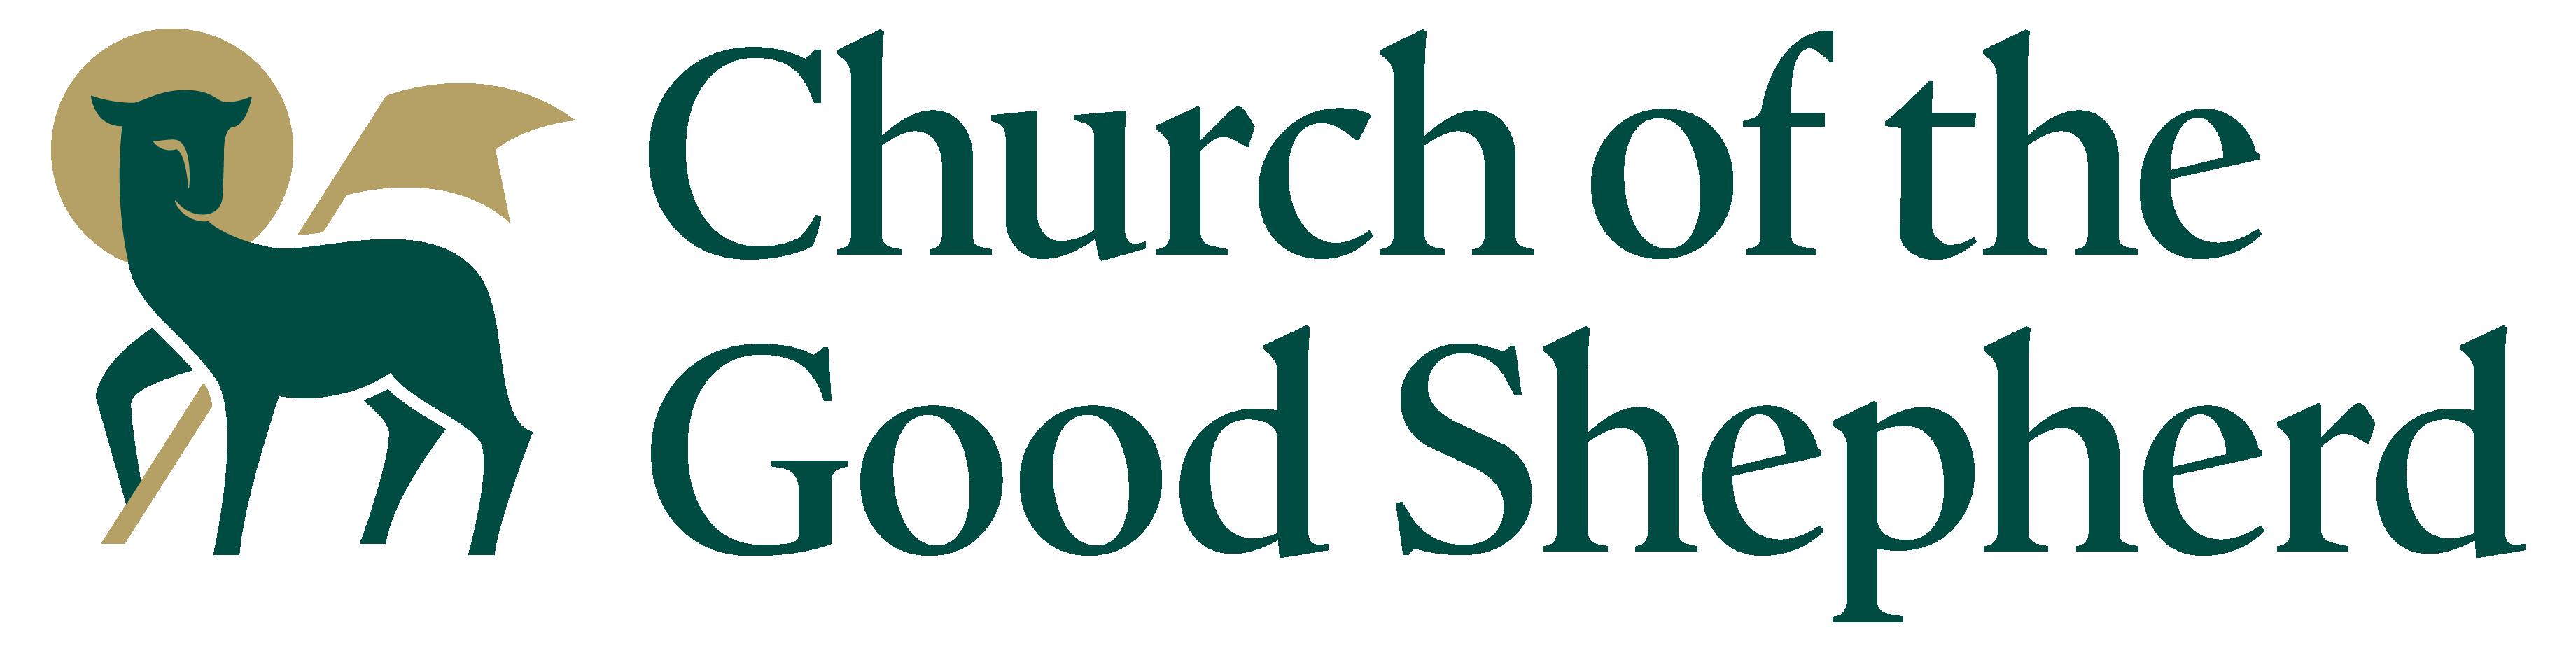 Home - Church of the Good Shepherd